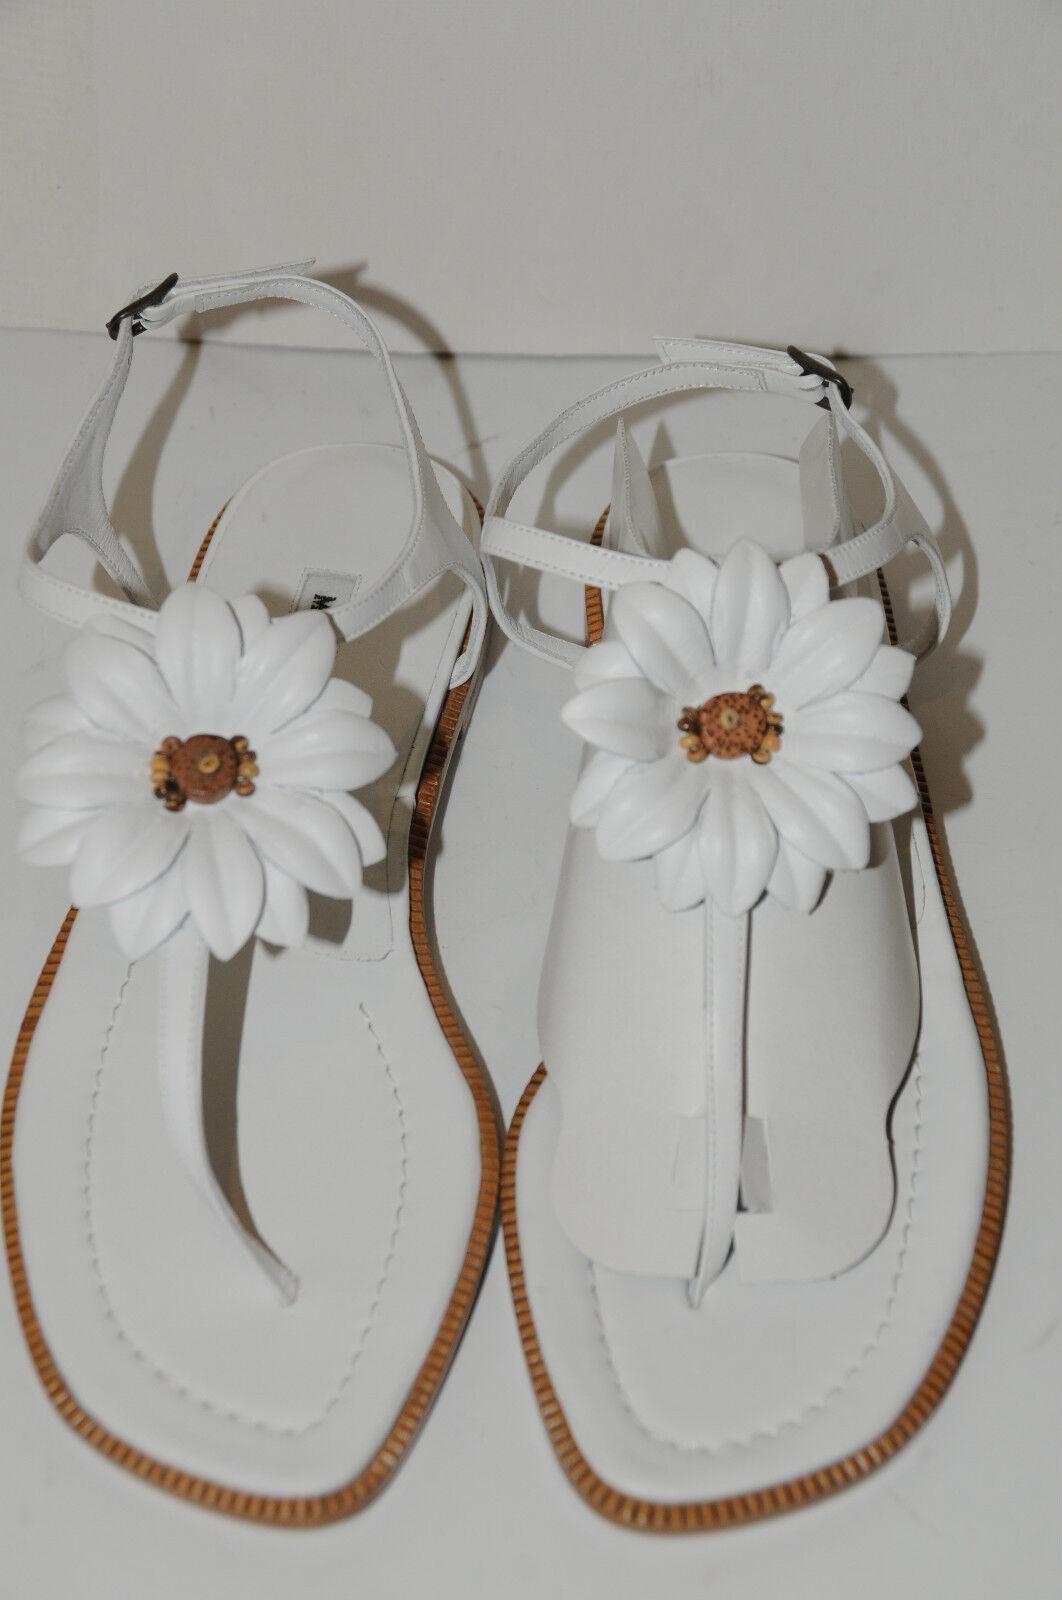 Neuf Manolo Blahnik Crisp Fleur Blanche String Plats Chaussures Sandales 40.5